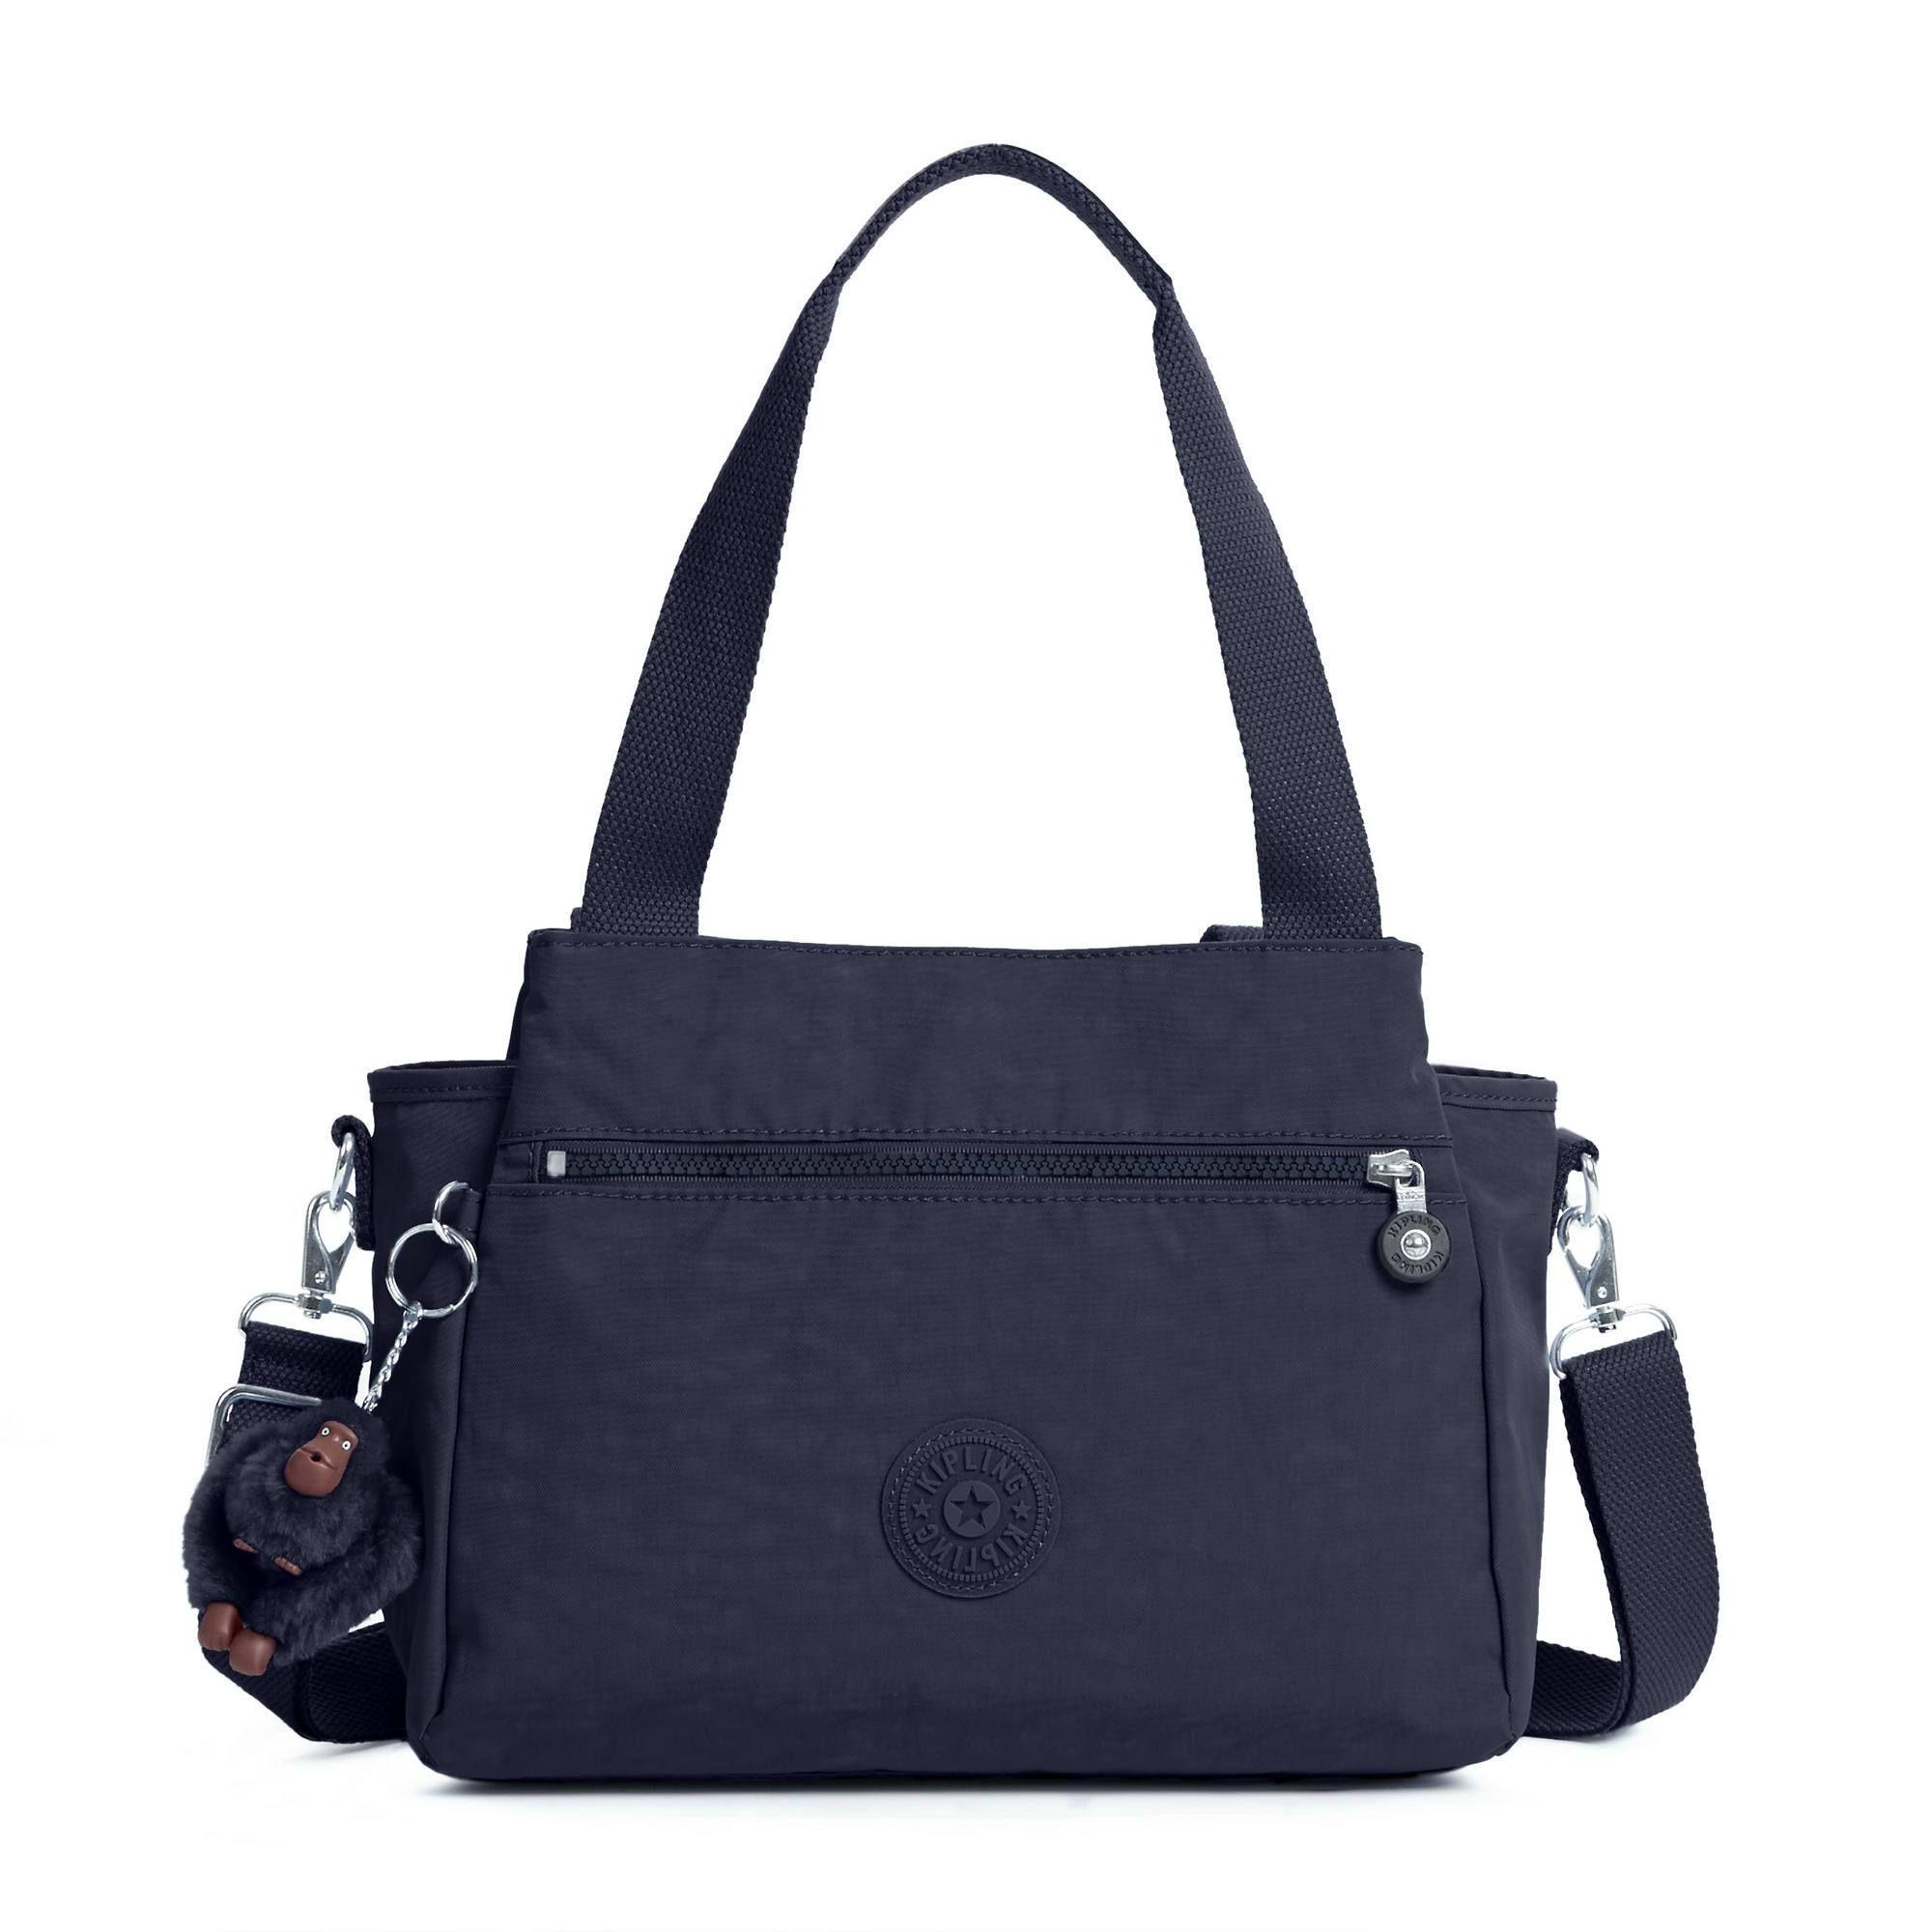 92fa71f8e0d Kipling Sabian Mini Bag (765 MXN) ❤ liked on Polyvore featuring ...